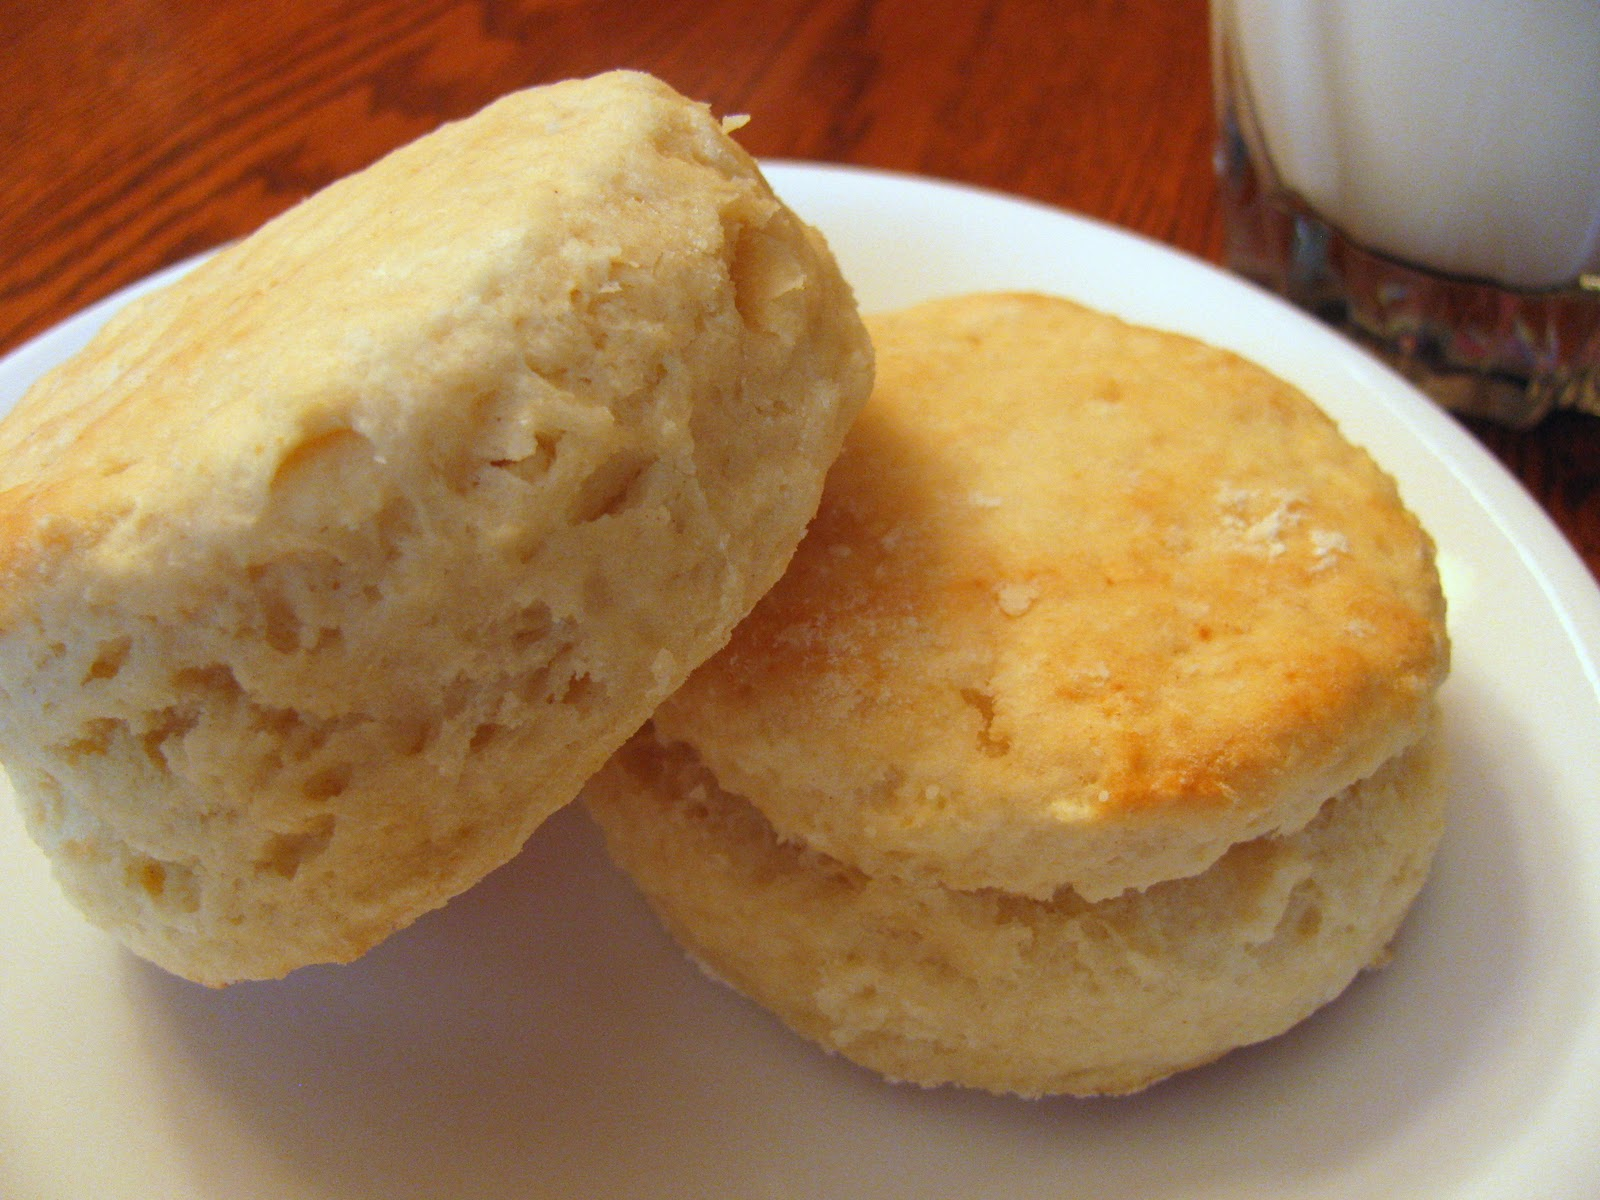 biscuits 2 cups flour 2 tsp baking powder 1 tsp salt ¼ tsp baking ...